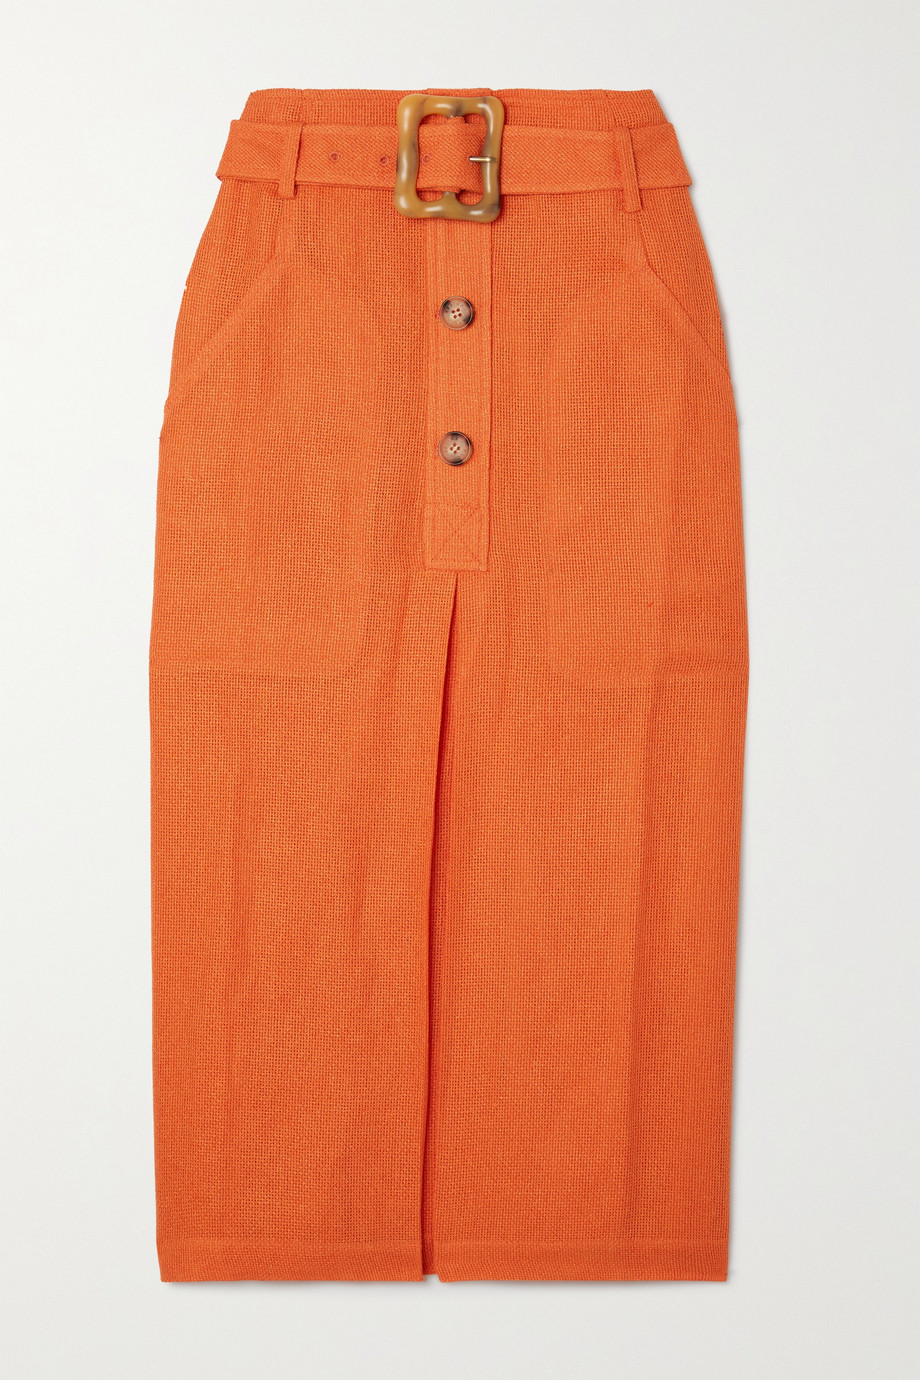 REJINA PYO Tasmin belted woven midi skirt